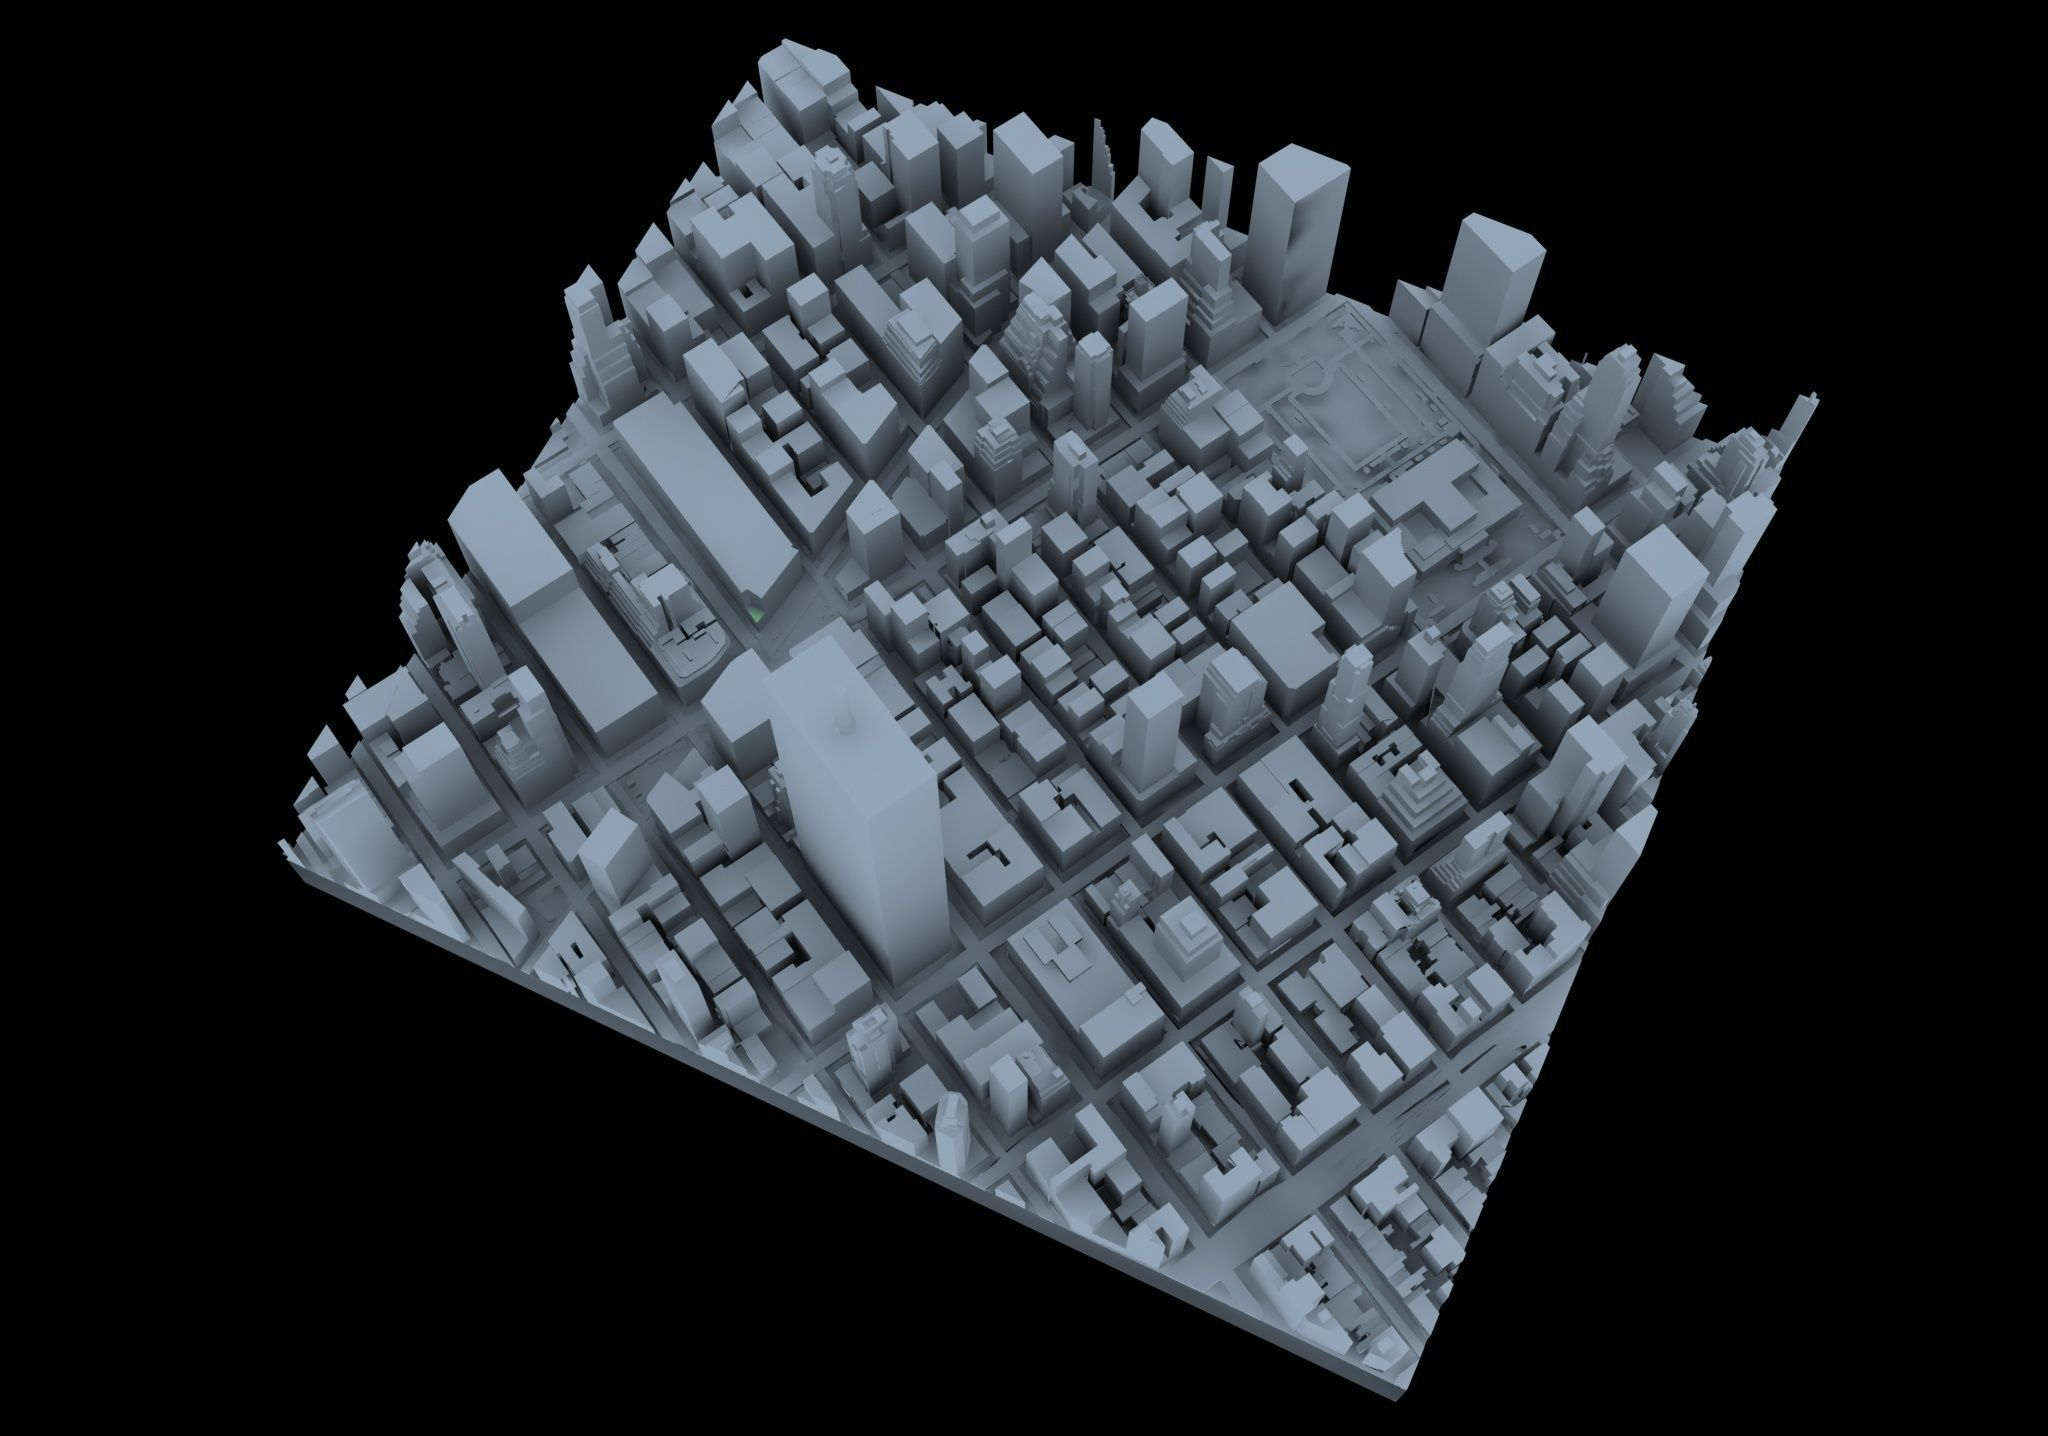 New York City model puzzle